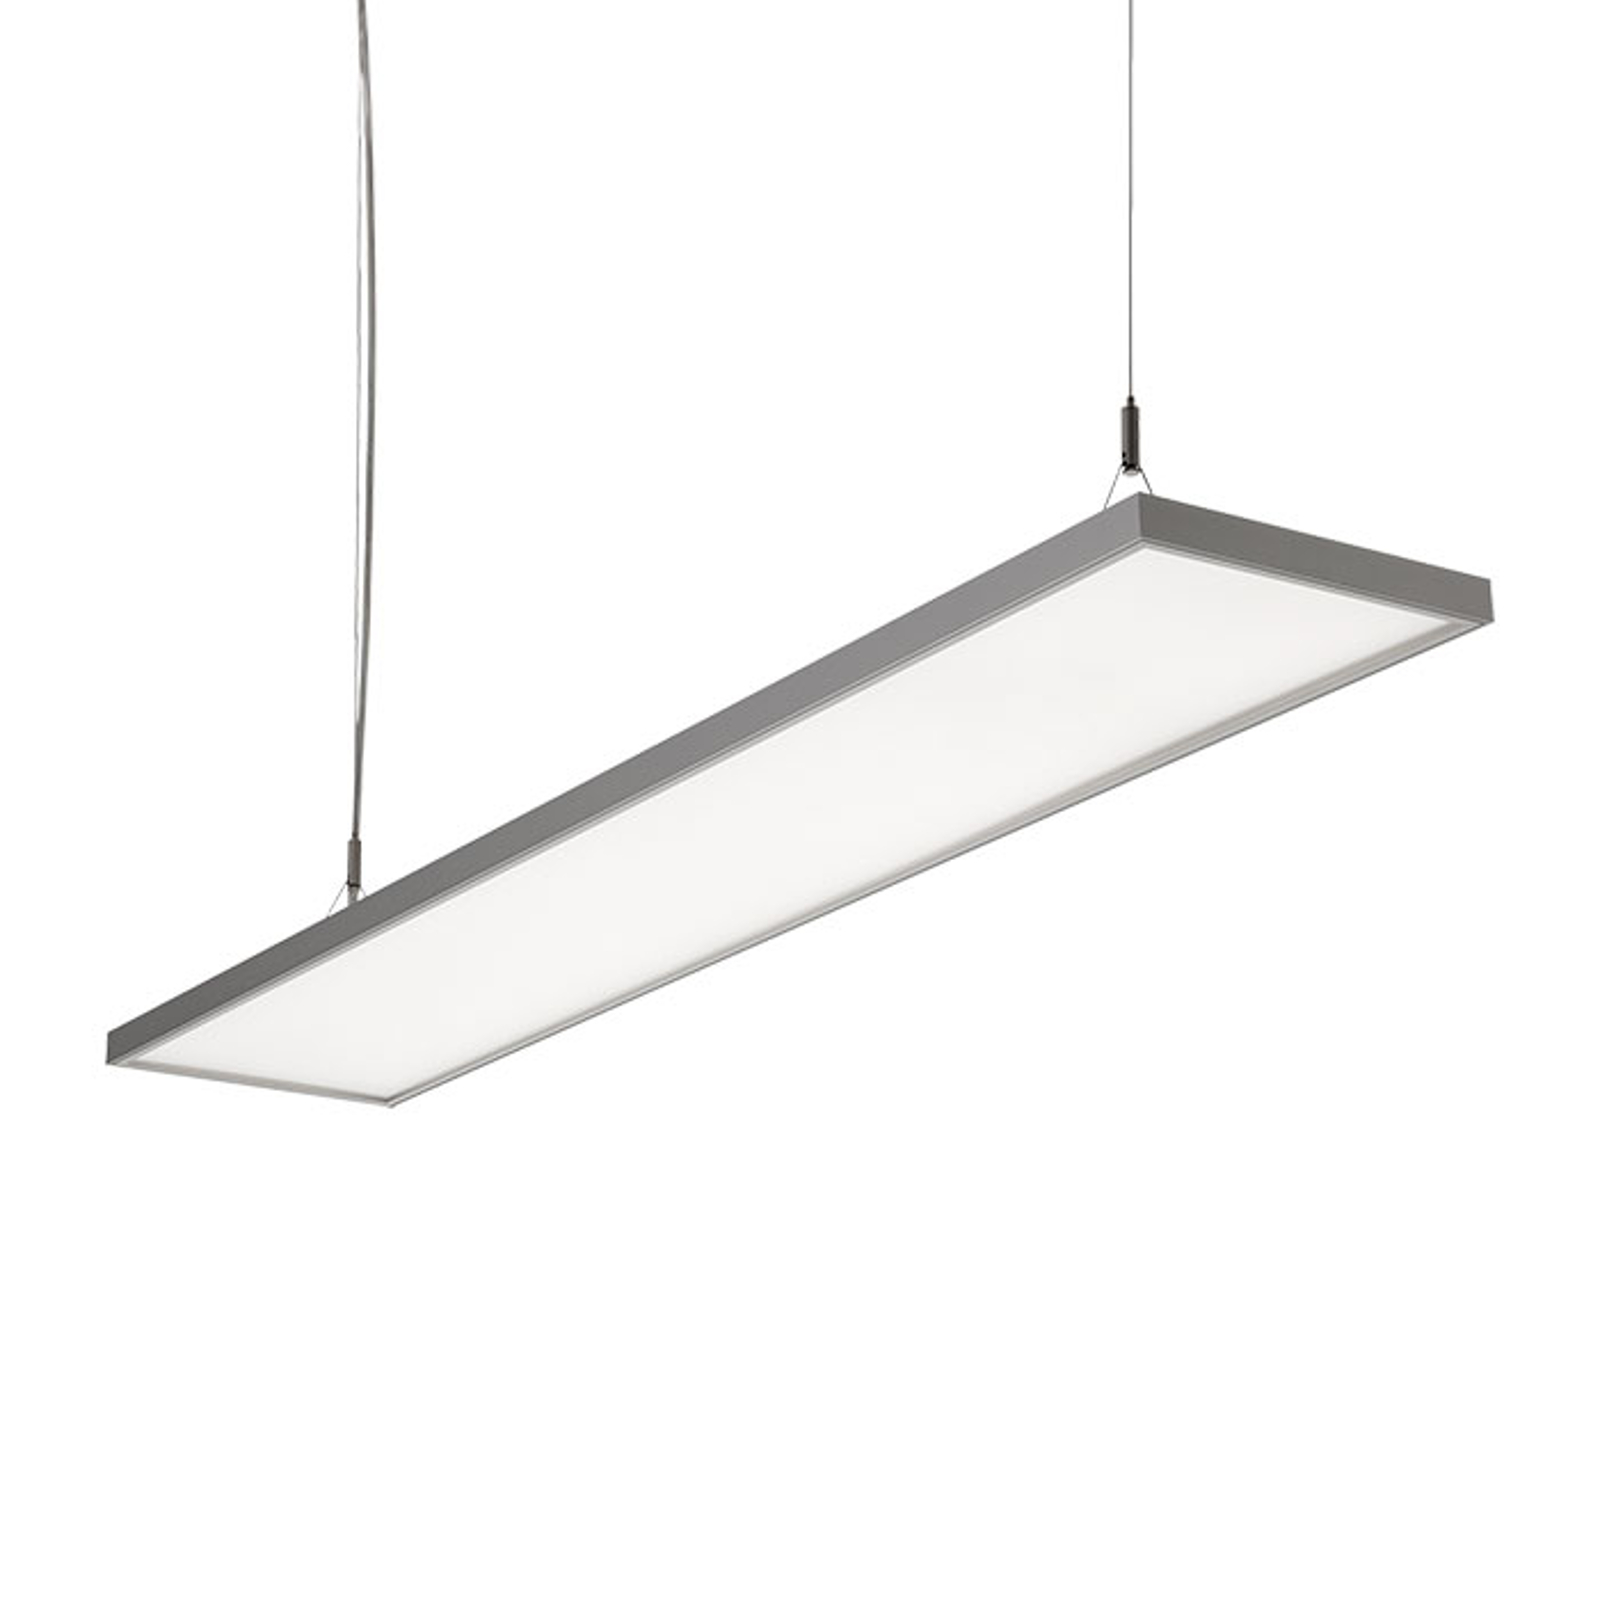 Lampa wisząca LED C95-P srebrnoszara 119,4 cm